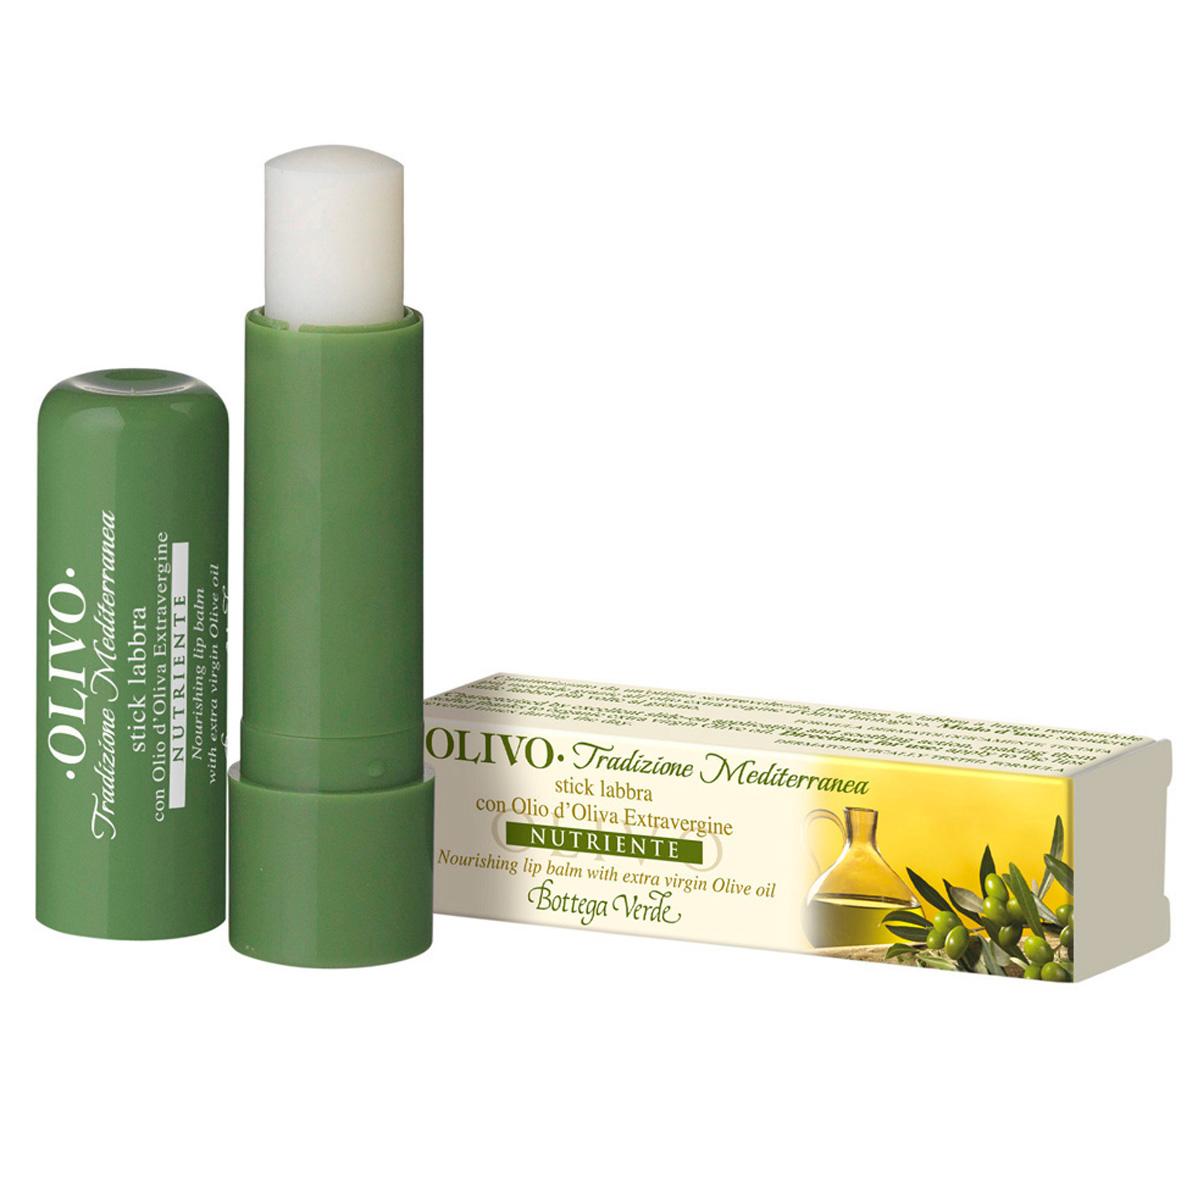 Balsam de buze cu ulei de maslin extravirgin, incolor - Olivo, 5 ML